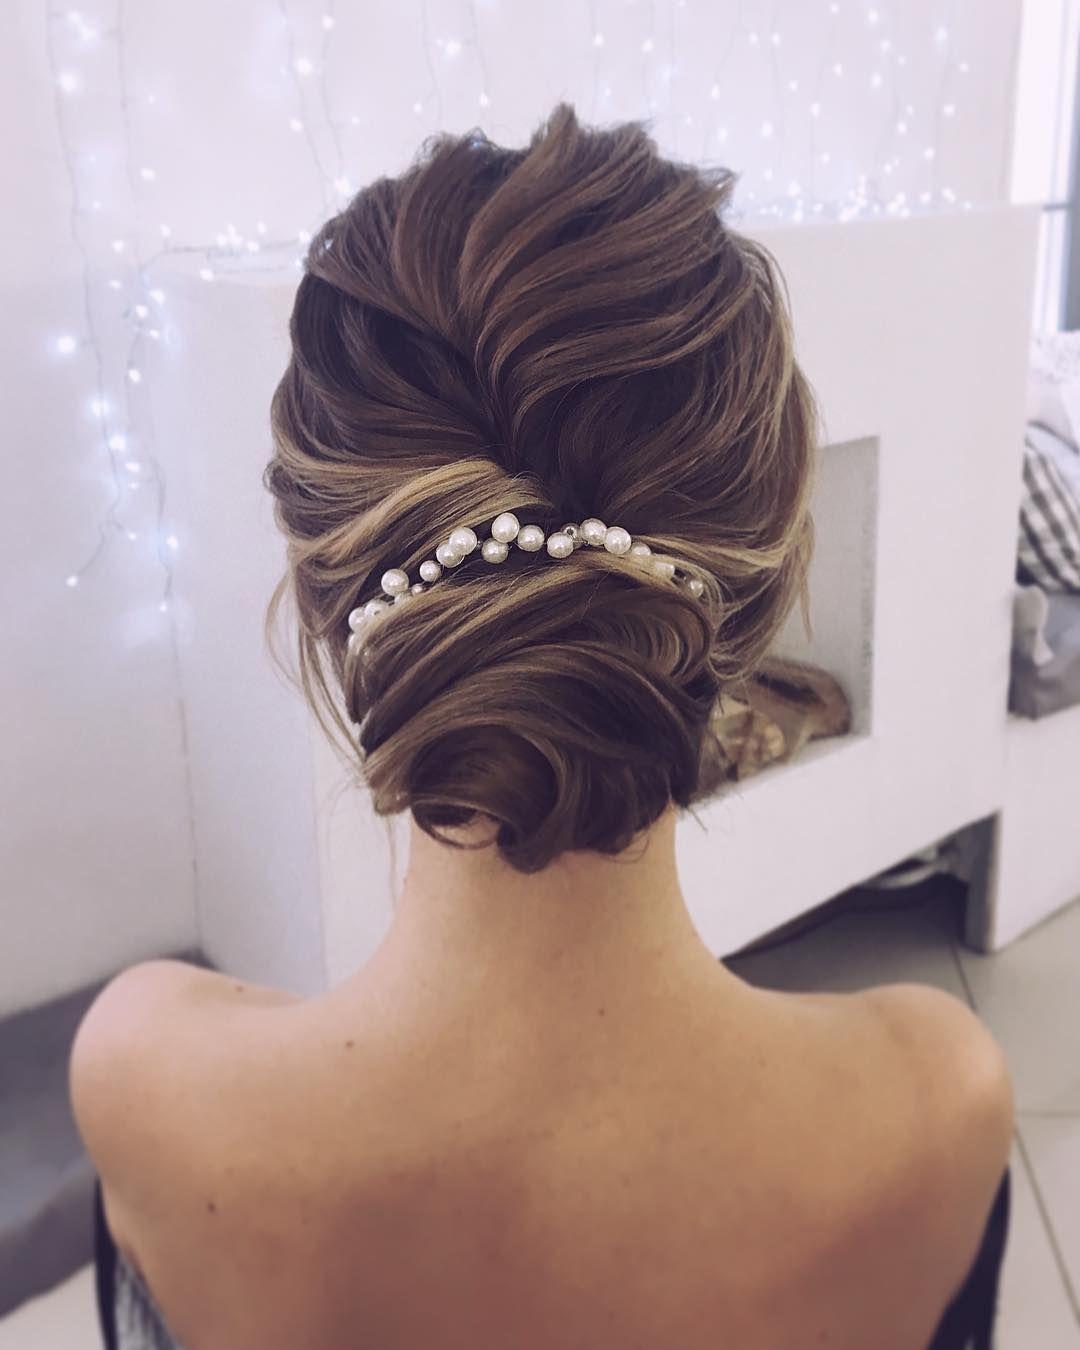 Jaw dropping wedding updo hairstyle inspiration penteados cabelo jaw dropping wedding updo hairstyle inspiration junglespirit Gallery